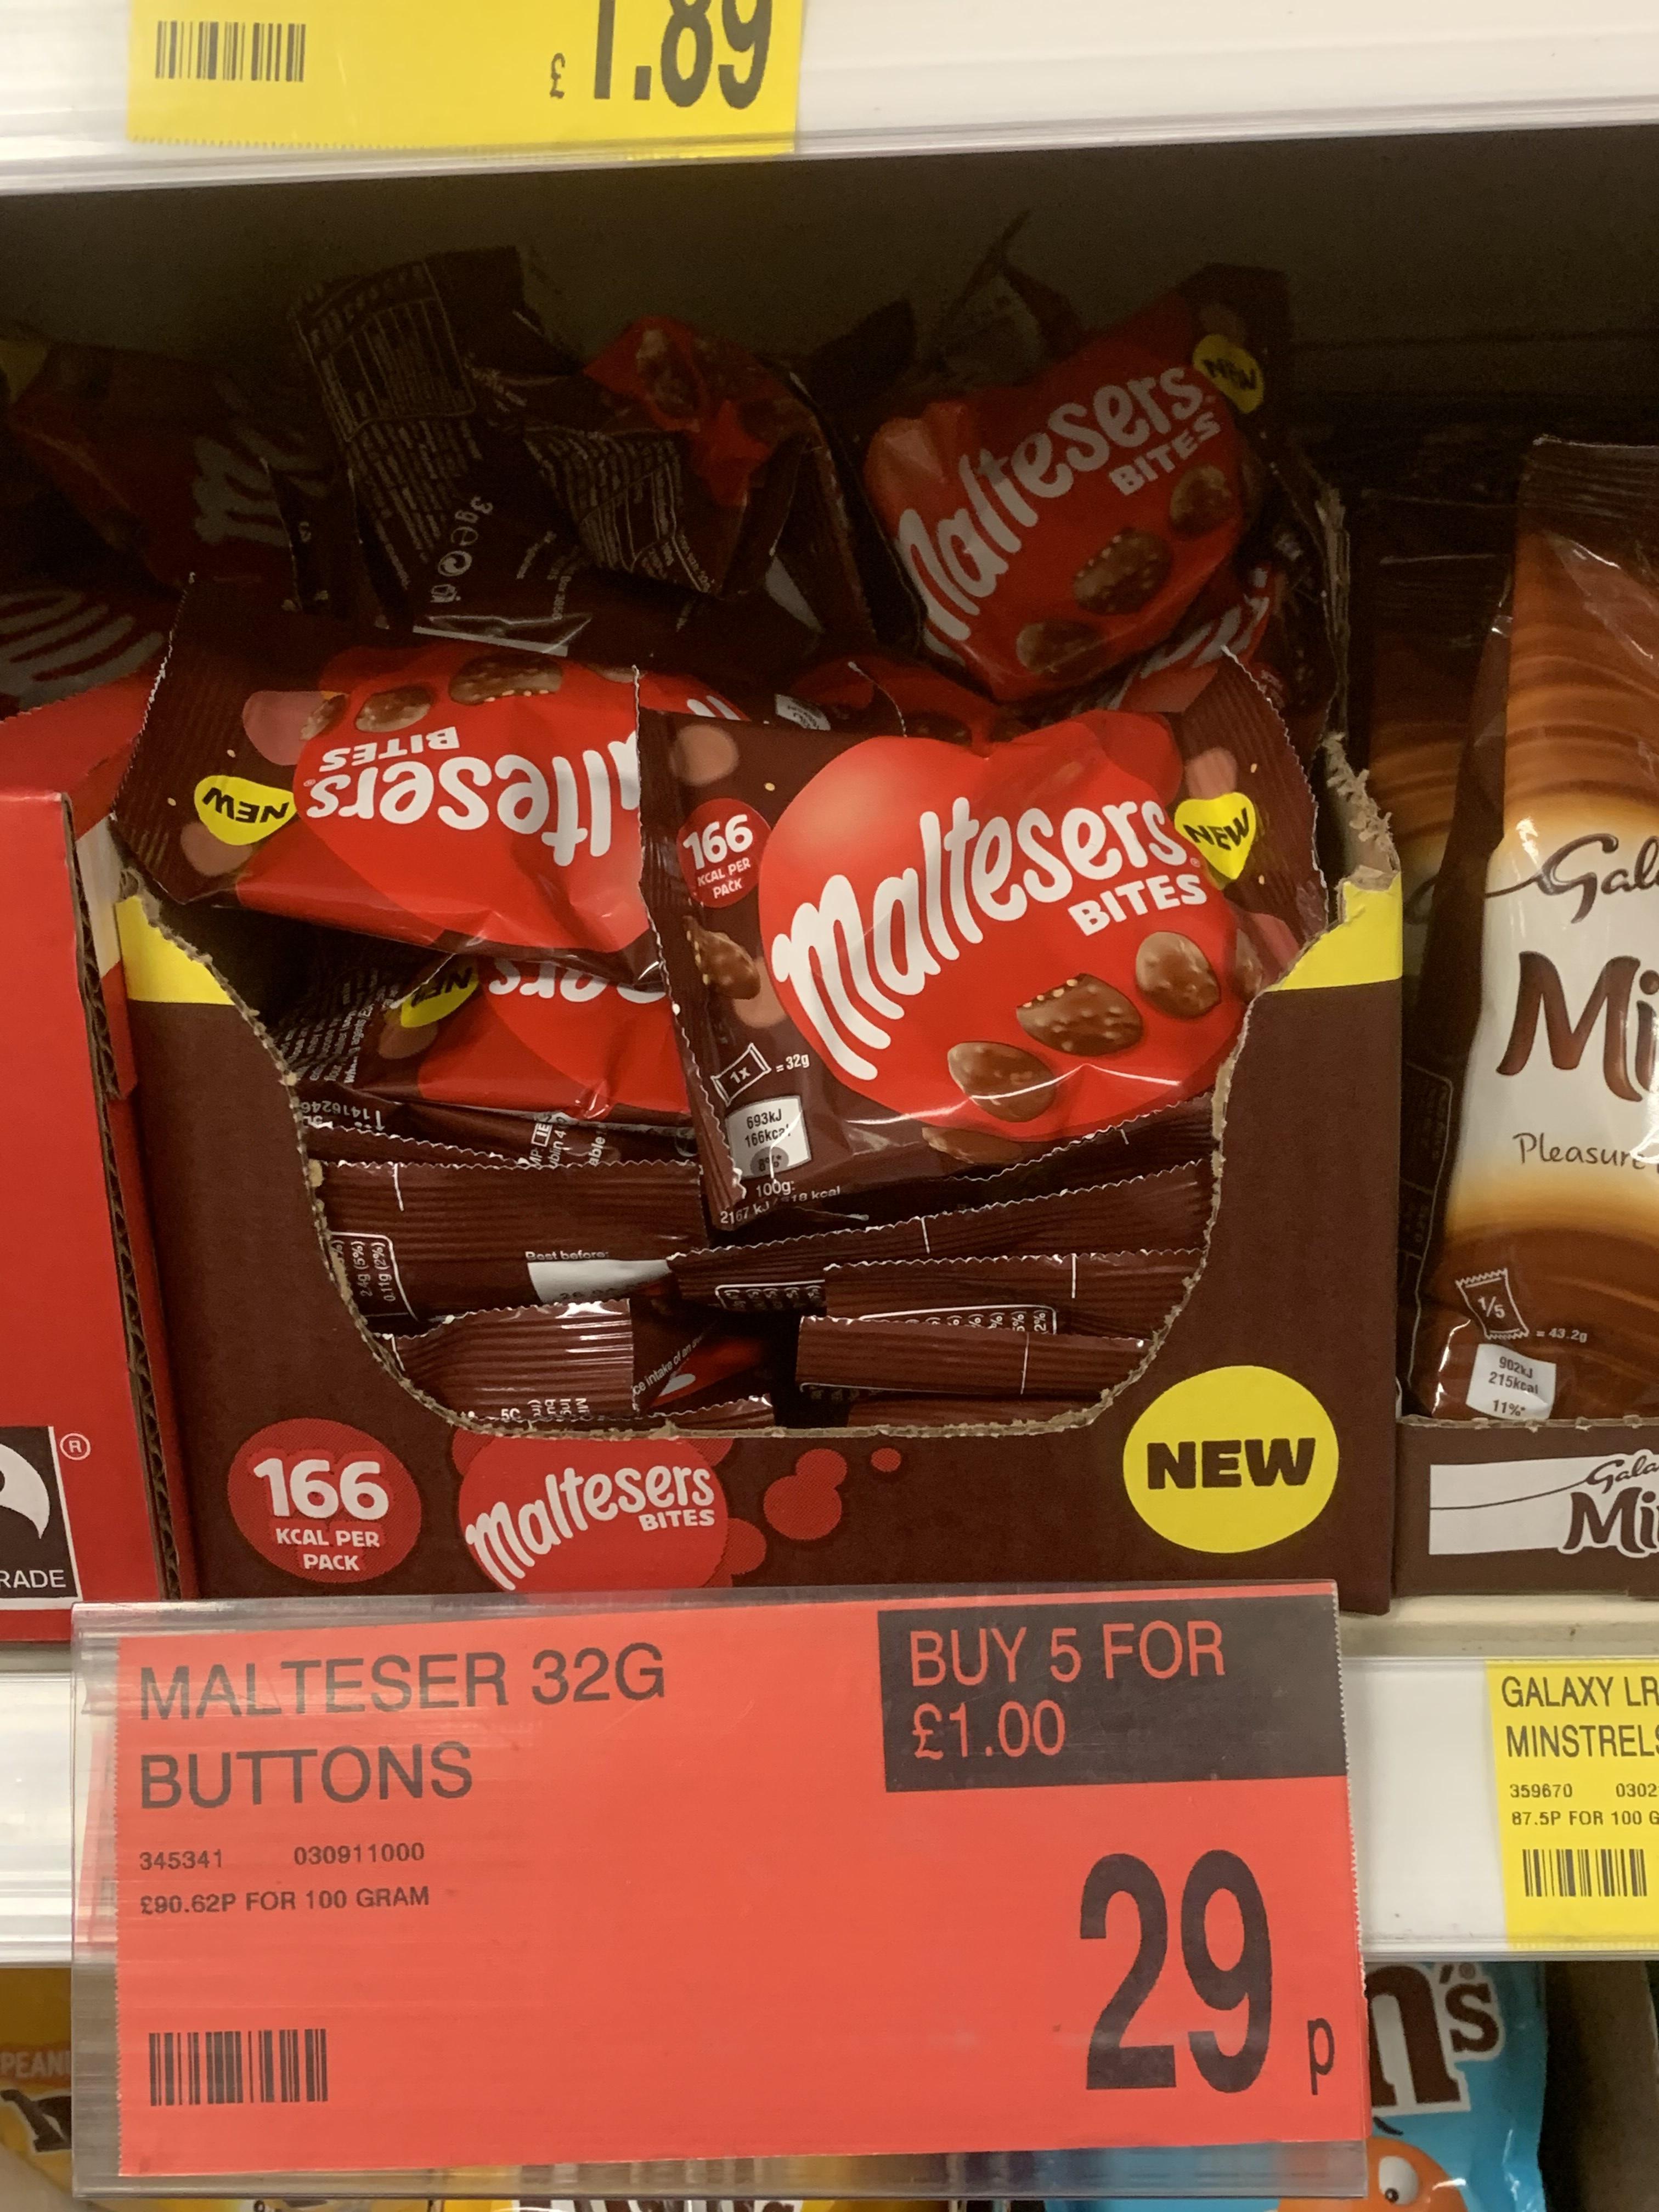 Maltesers button / bite bags 32g 5 for £1 @ B & M Bargains Sheffield